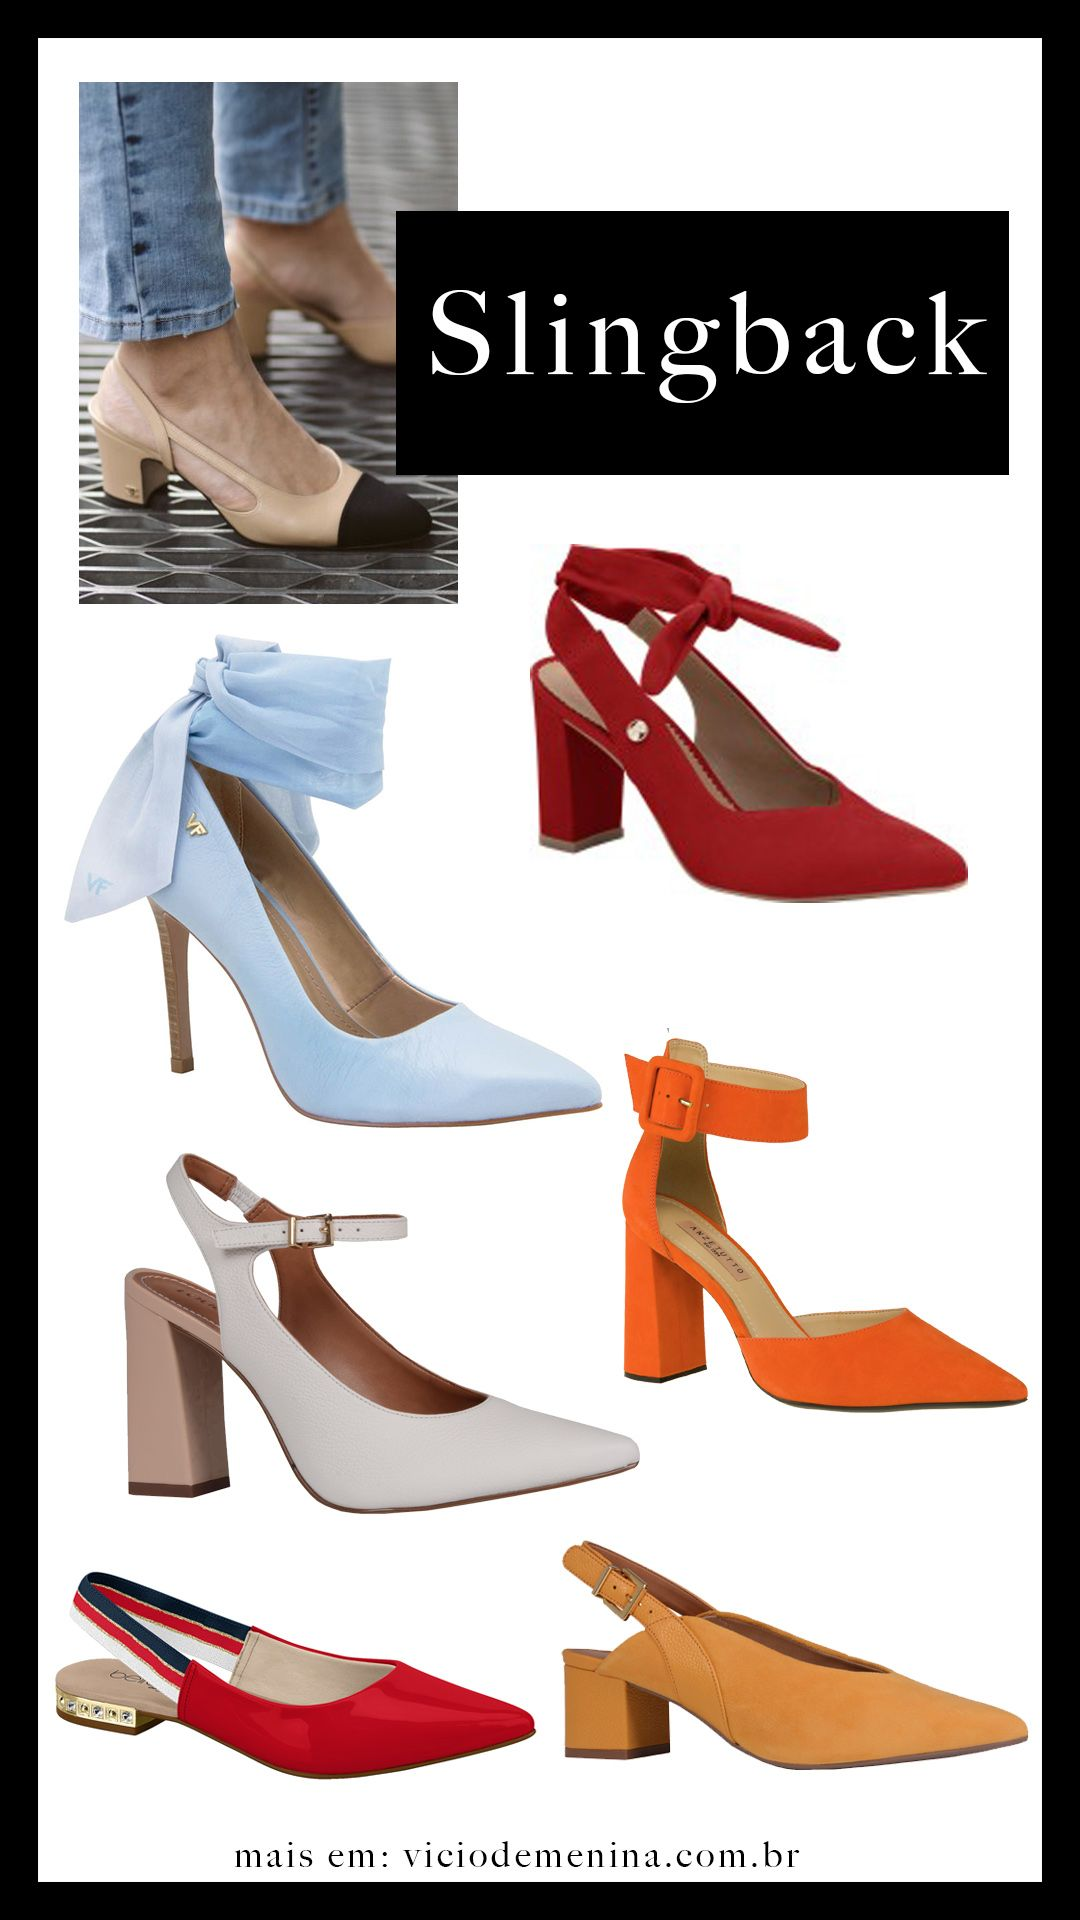 ed54148c43f sapatos tendencias primavera verao slingback 2019 Sapatos Femininos  Importados